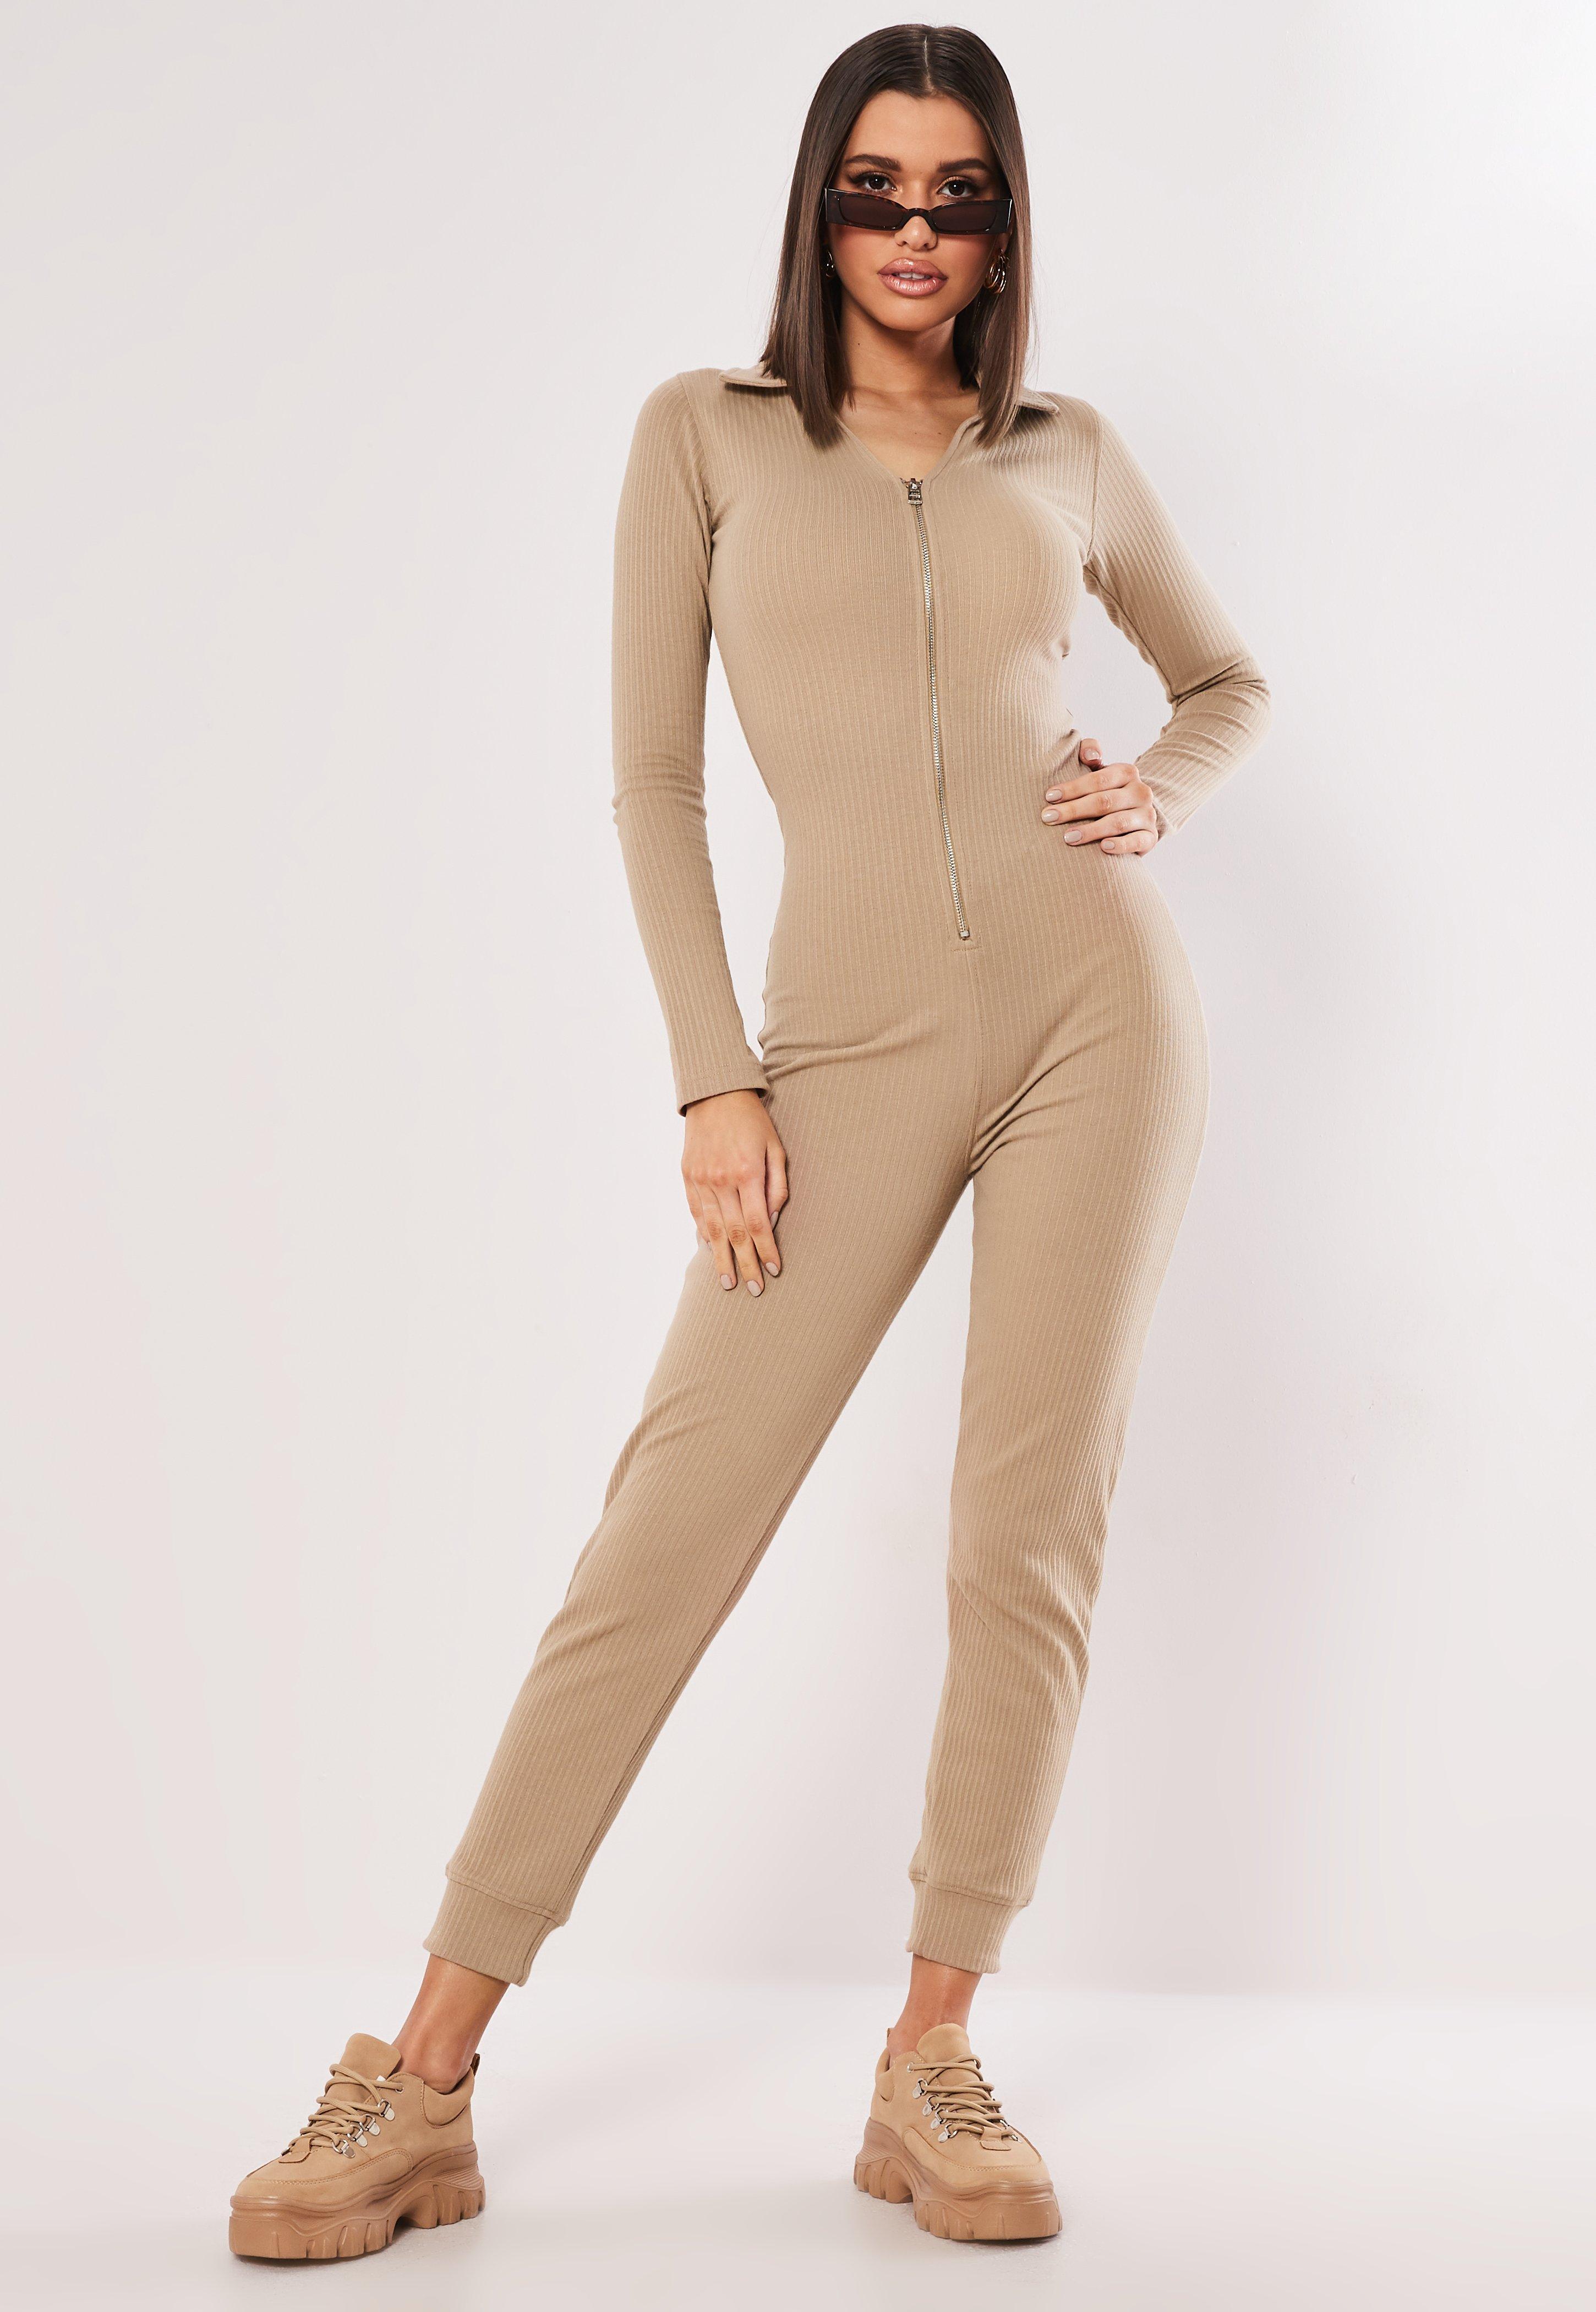 c8c51823de Missguided - Natural Camel Zip Collar Ribbed Jumpsuit - Lyst. View  fullscreen